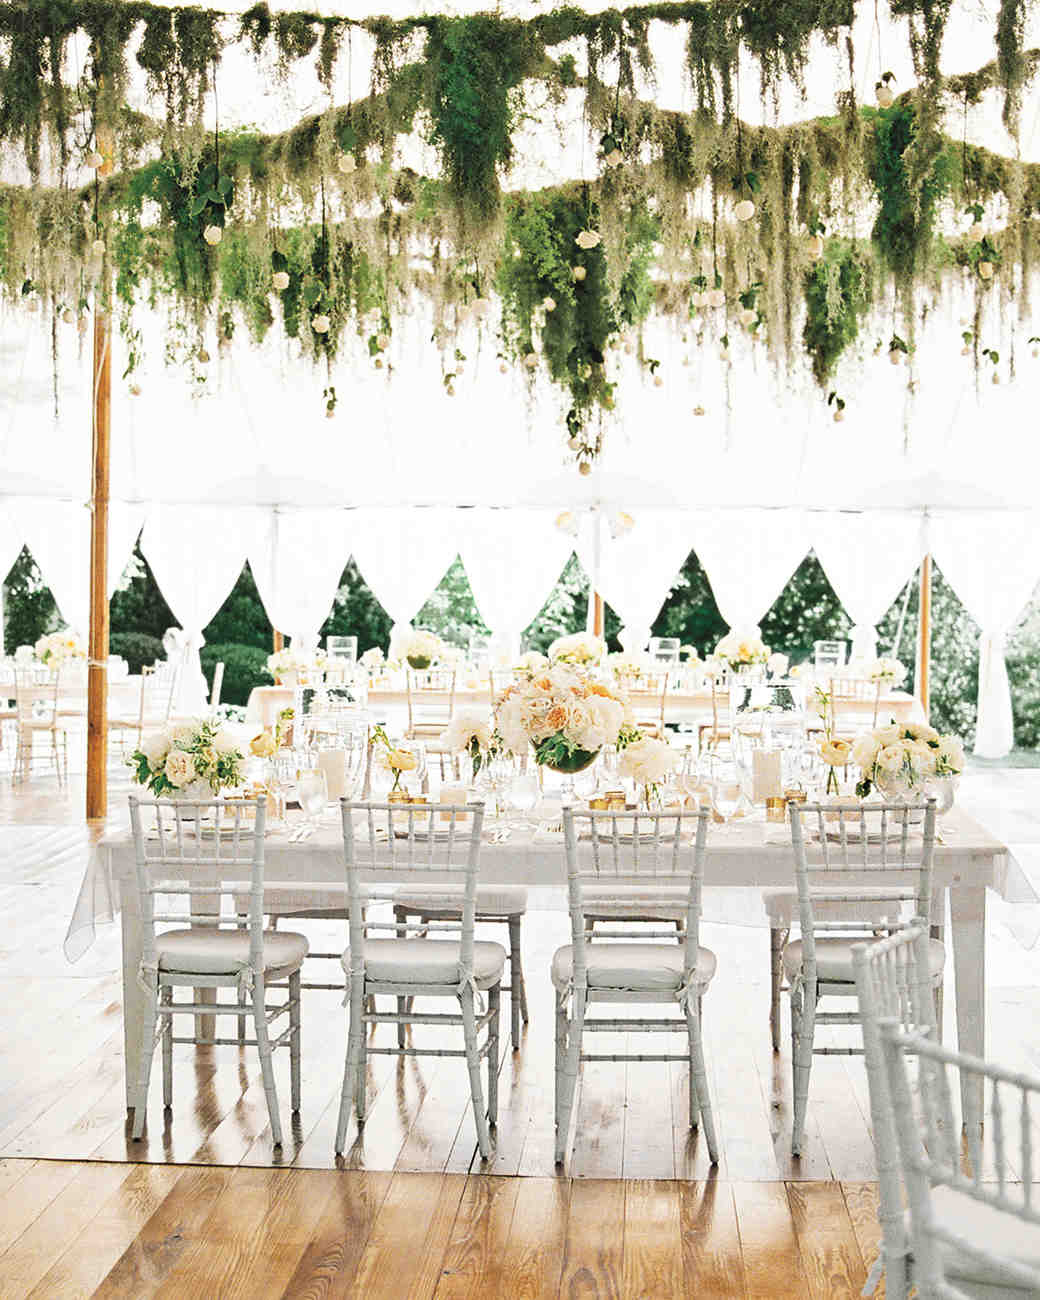 Lovely 33 Tent Decorating Ideas To Upgrade Your Wedding Reception | Martha Stewart  Weddings